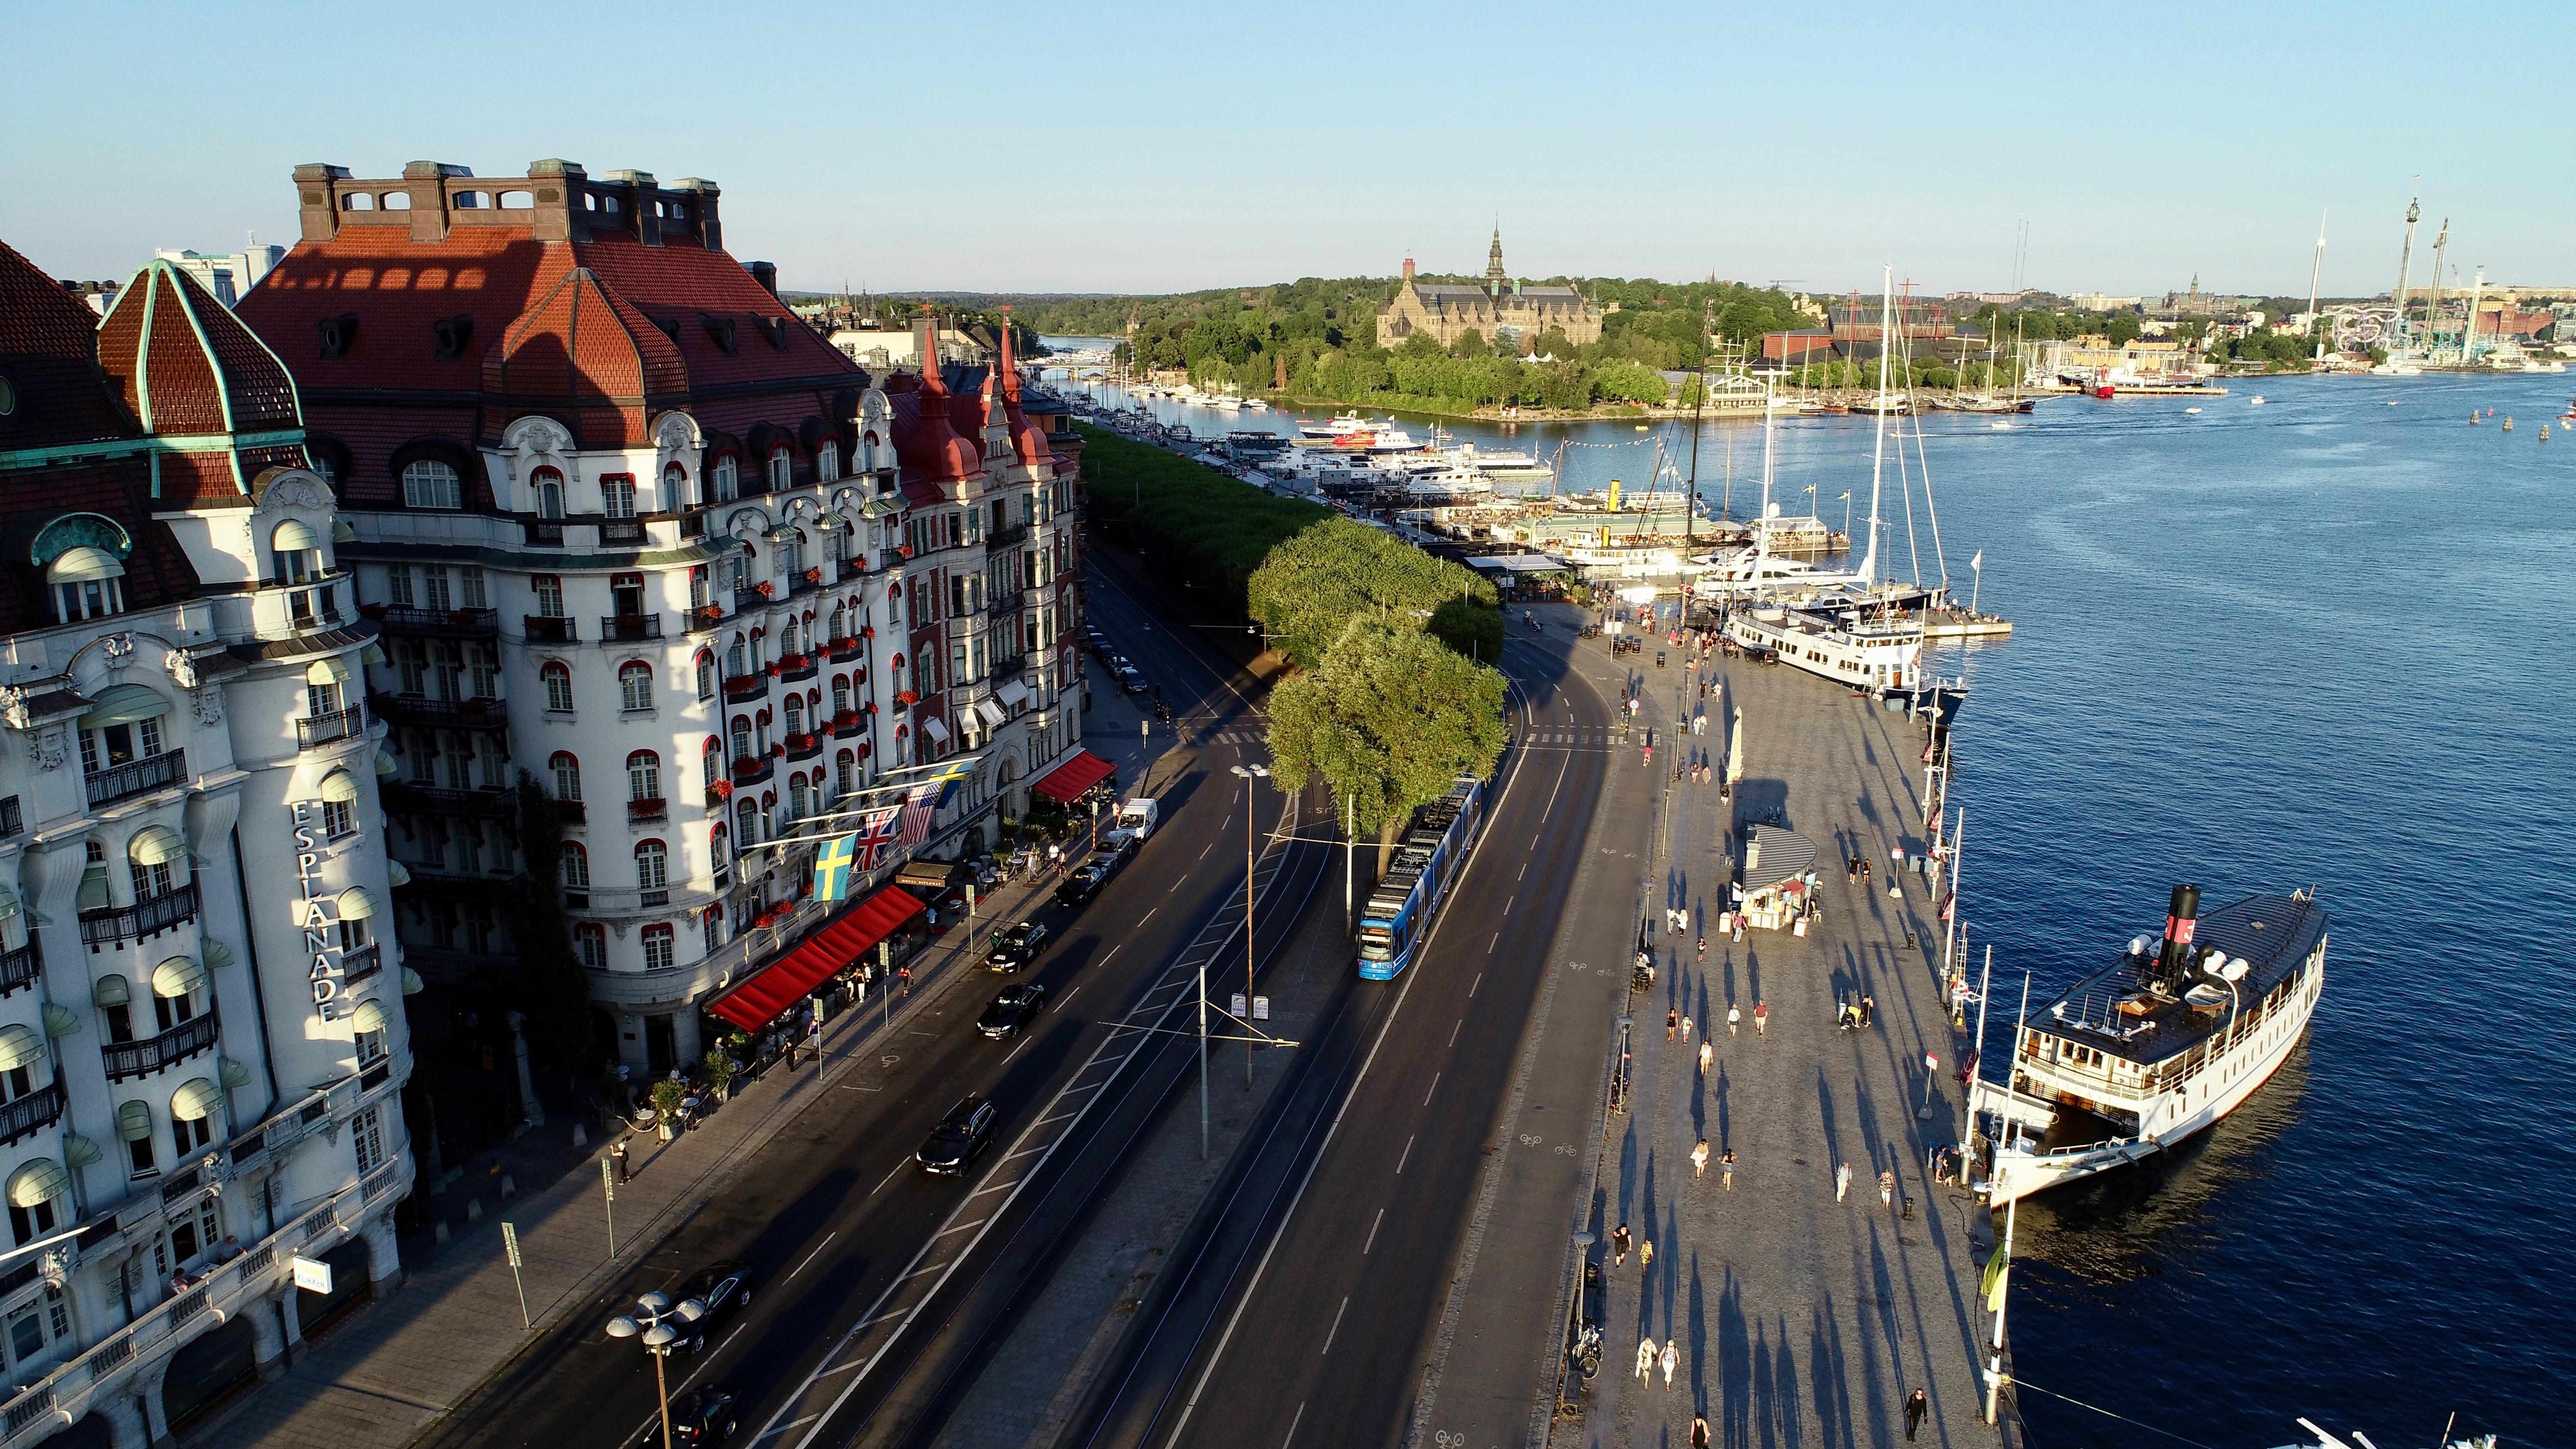 Hotel Diplomat Stockholm - @diplomathotel @hoteldiplomat #diplomathotel #hoteldiplomat